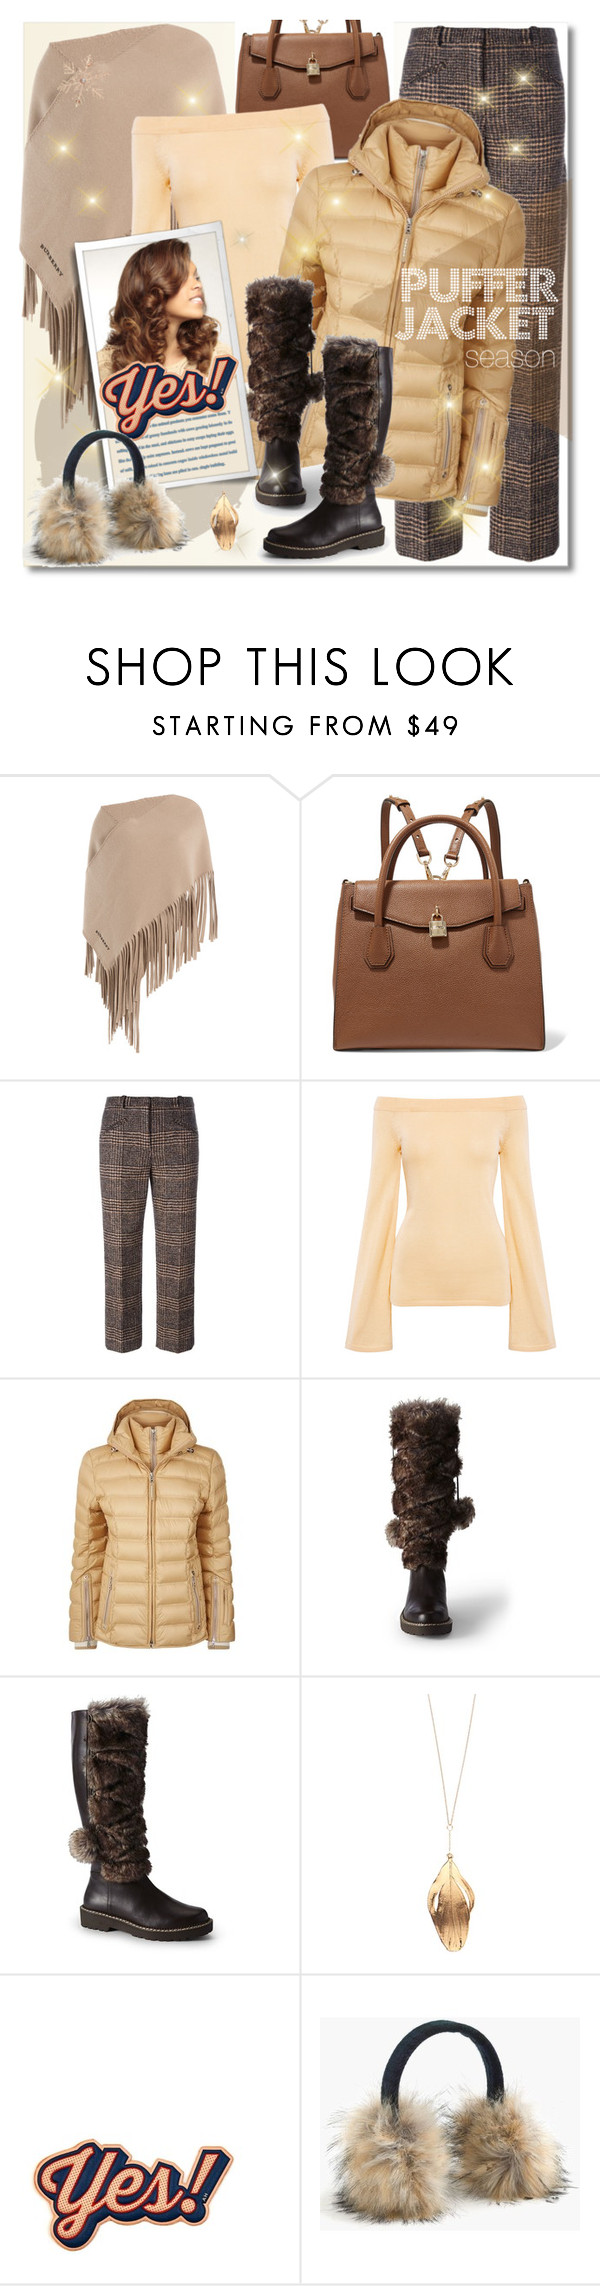 Shine In Your Puffer Jacket | Puffer jackets, Jackets, Women